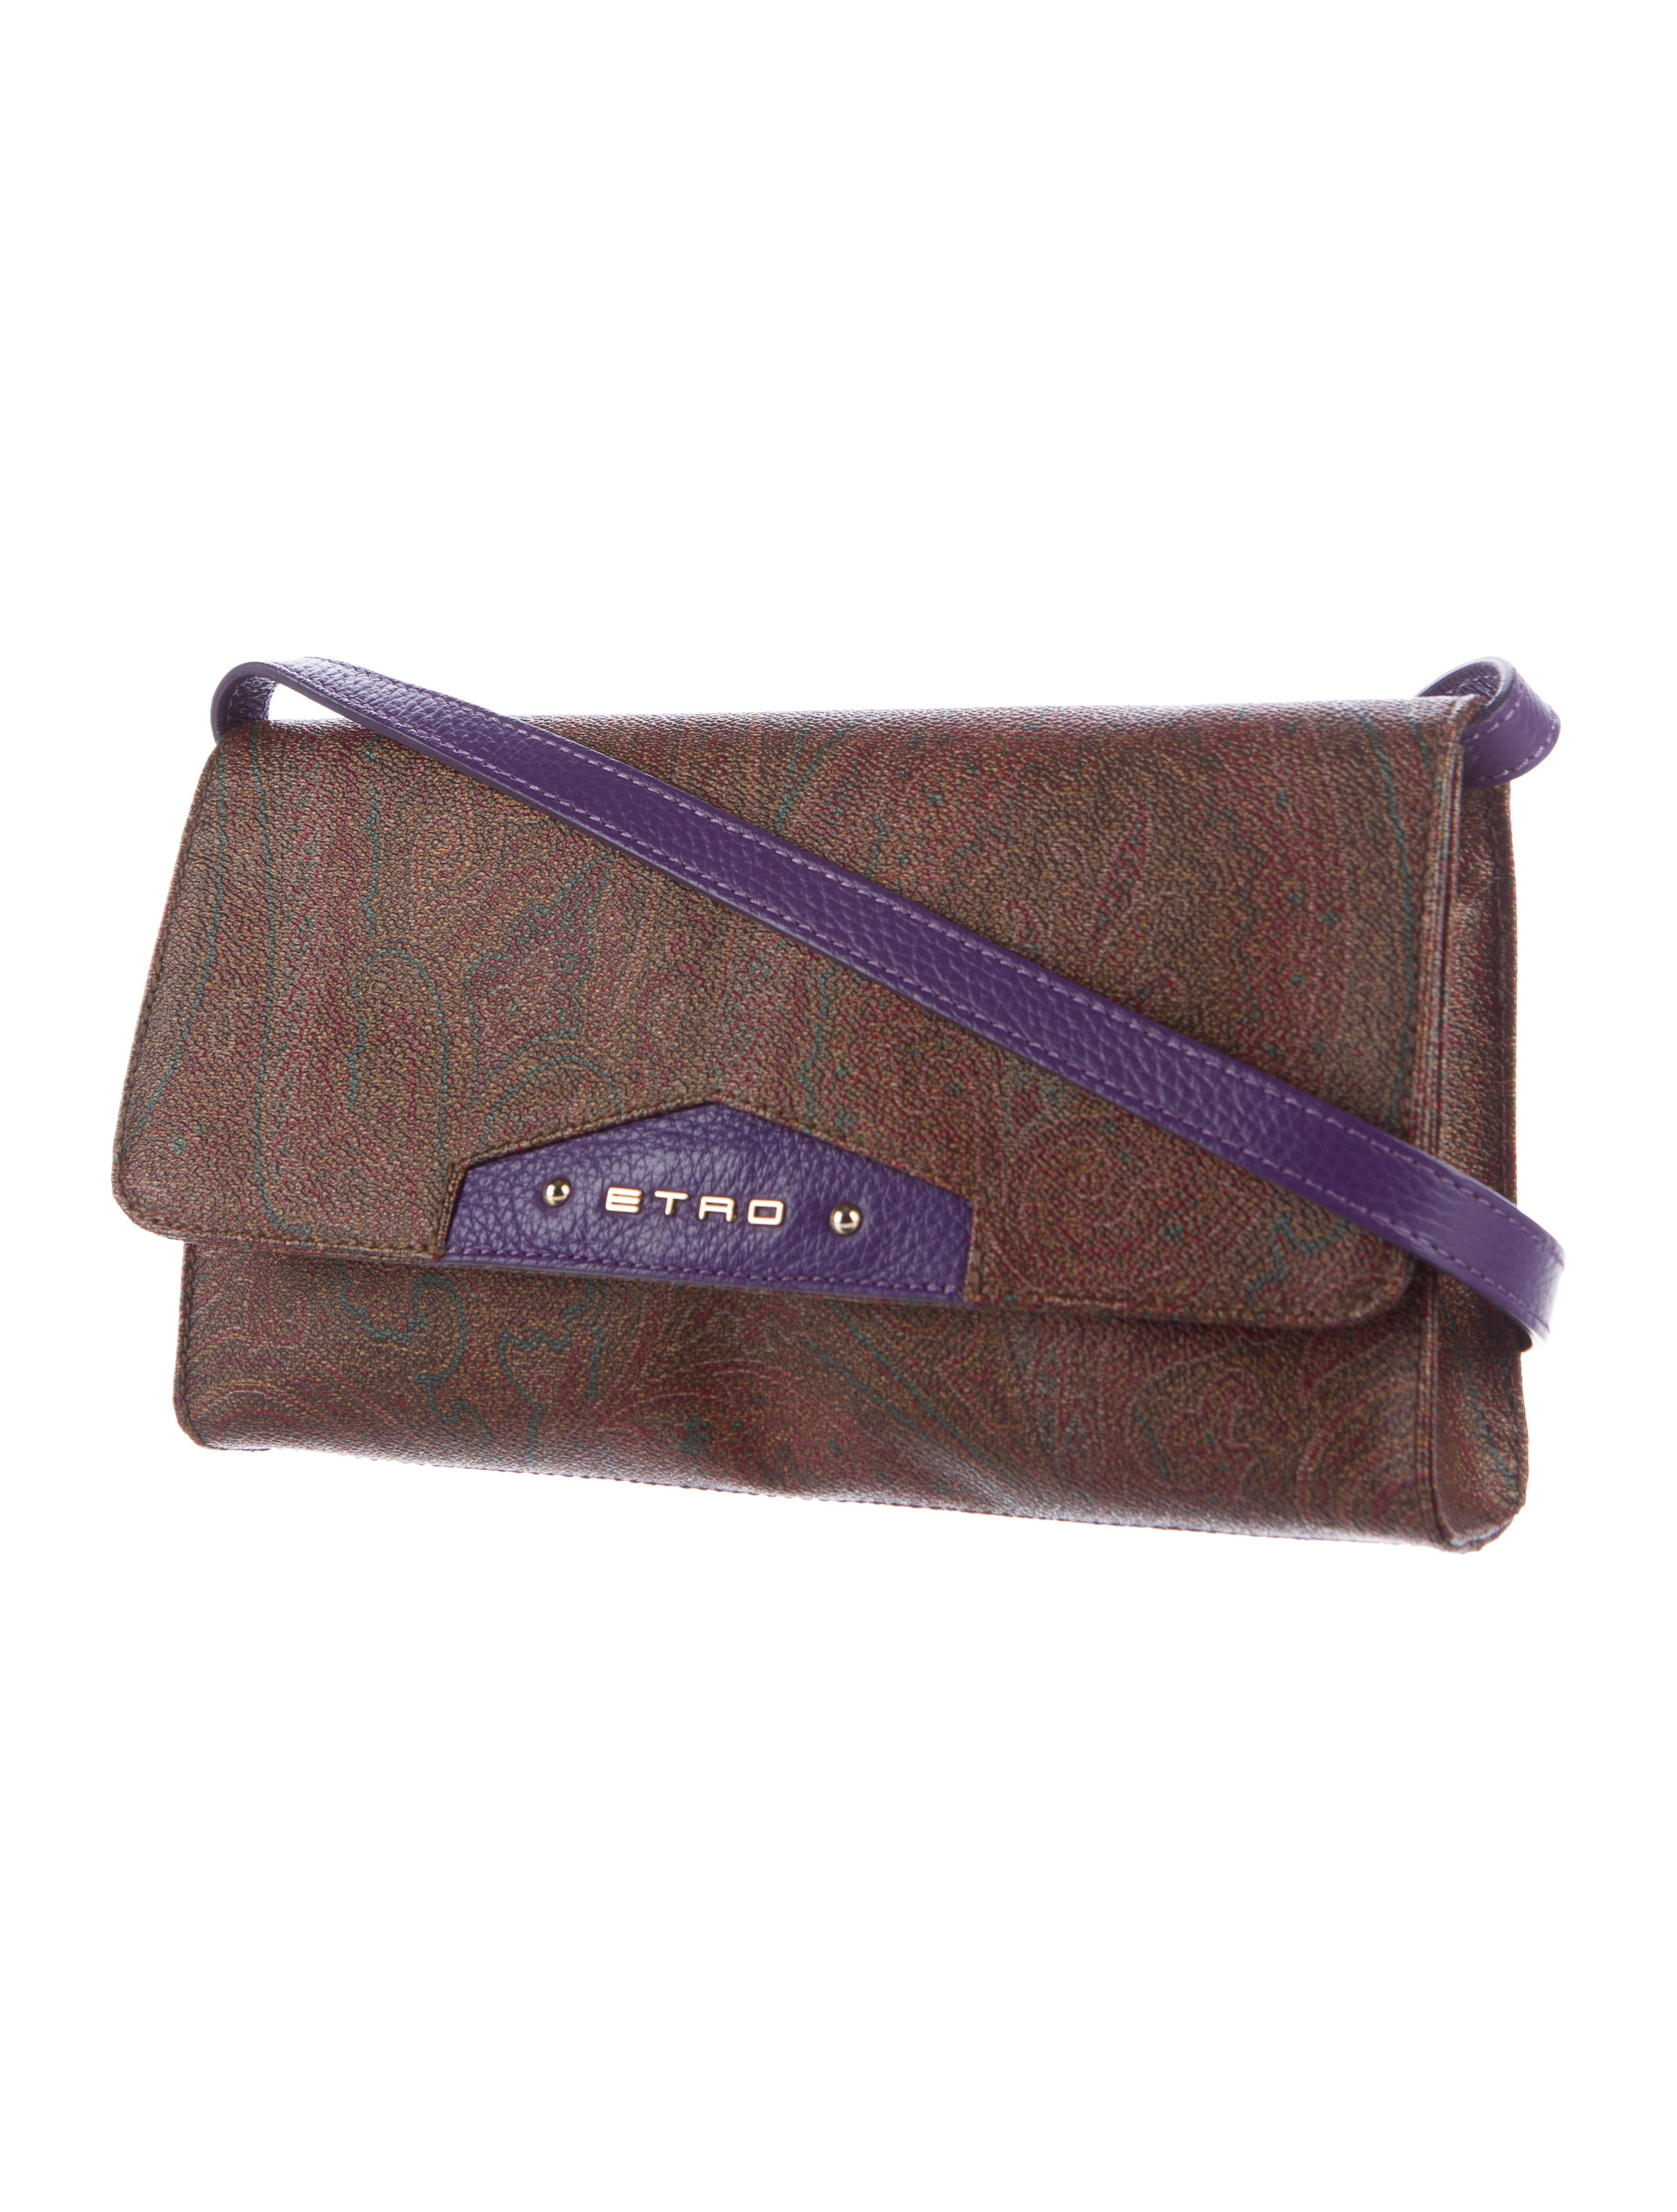 Etro Leather-Trimmed Paisley Crossbody - Handbags ...